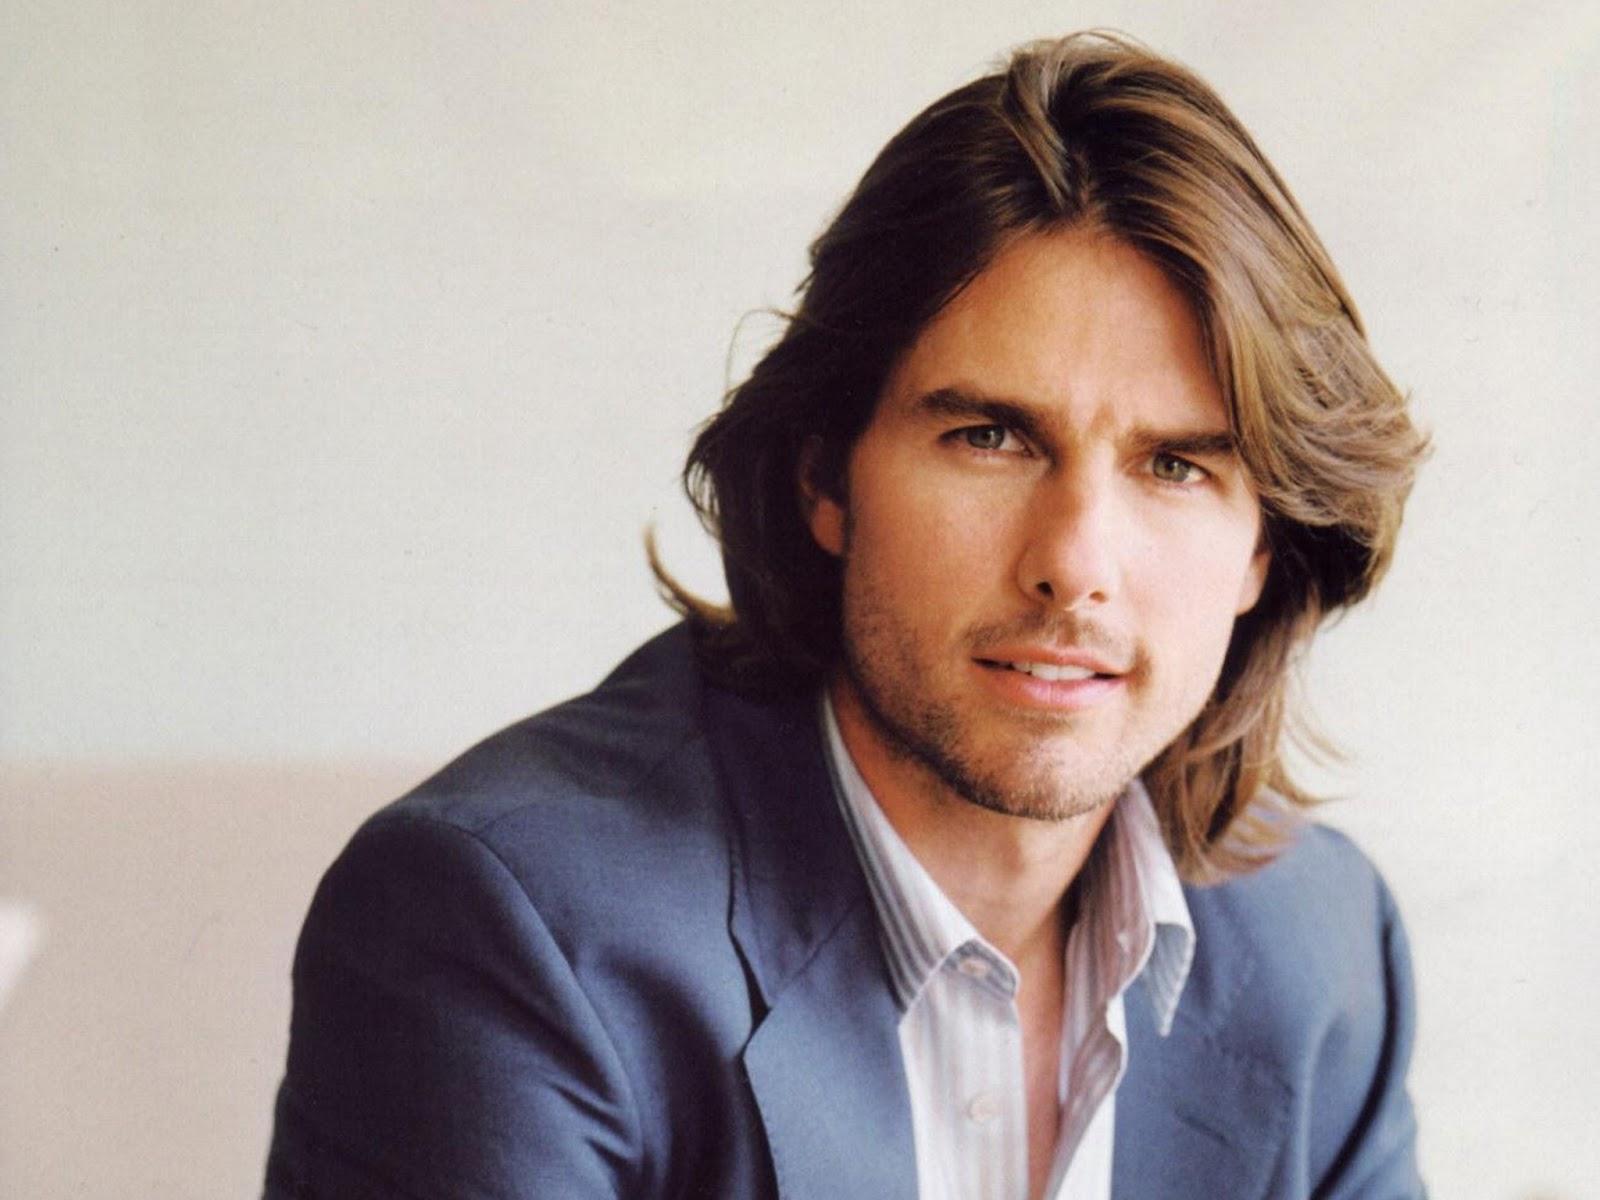 Tom Cruise: A Hollywood Phenomenon